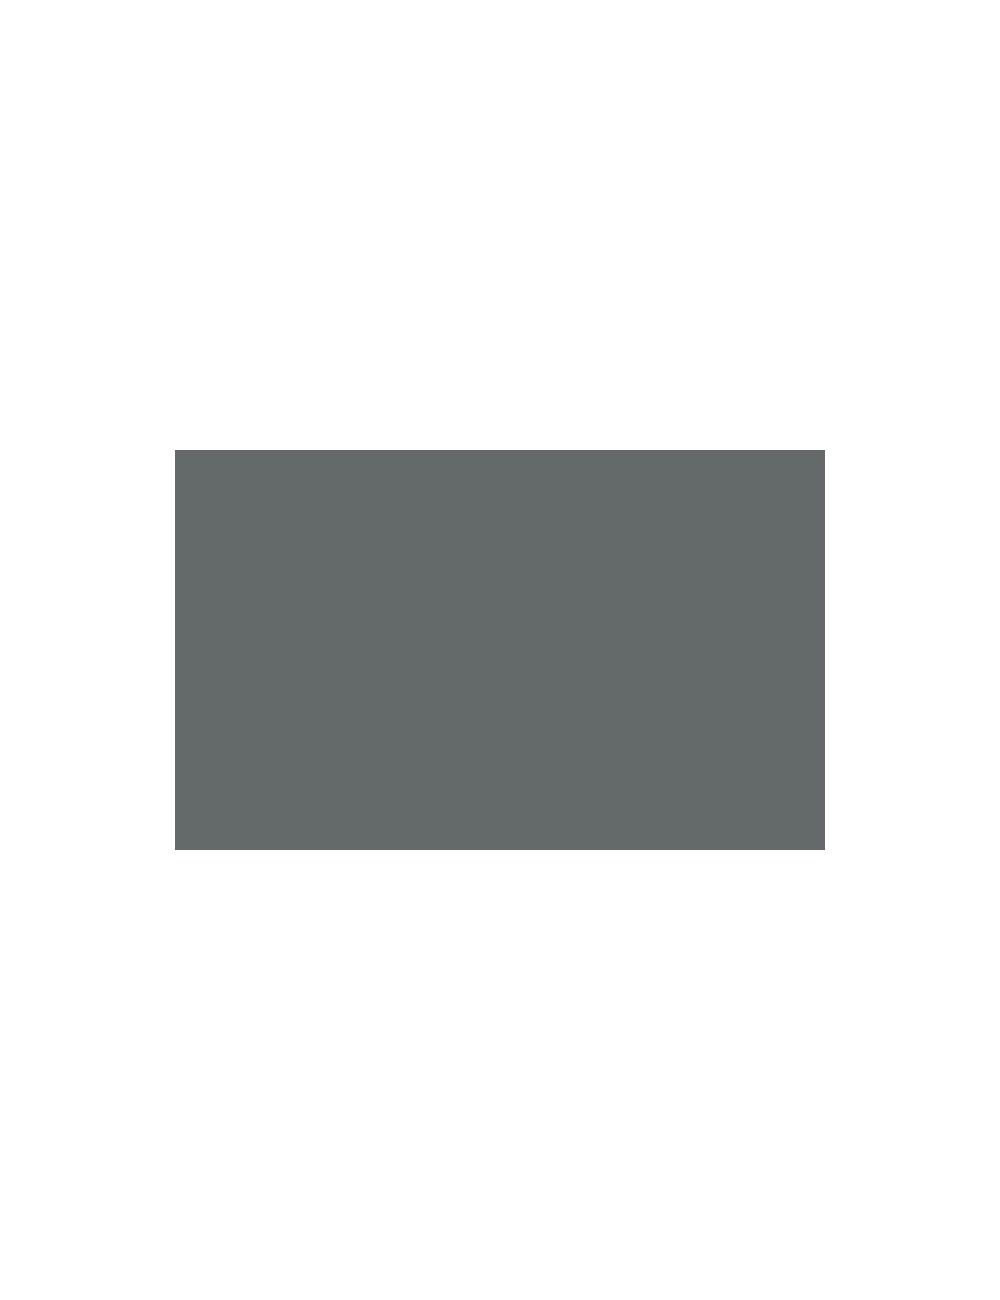 Lente Ojo de Pez Fancier 0.25X con MACRO www.apertura.cl